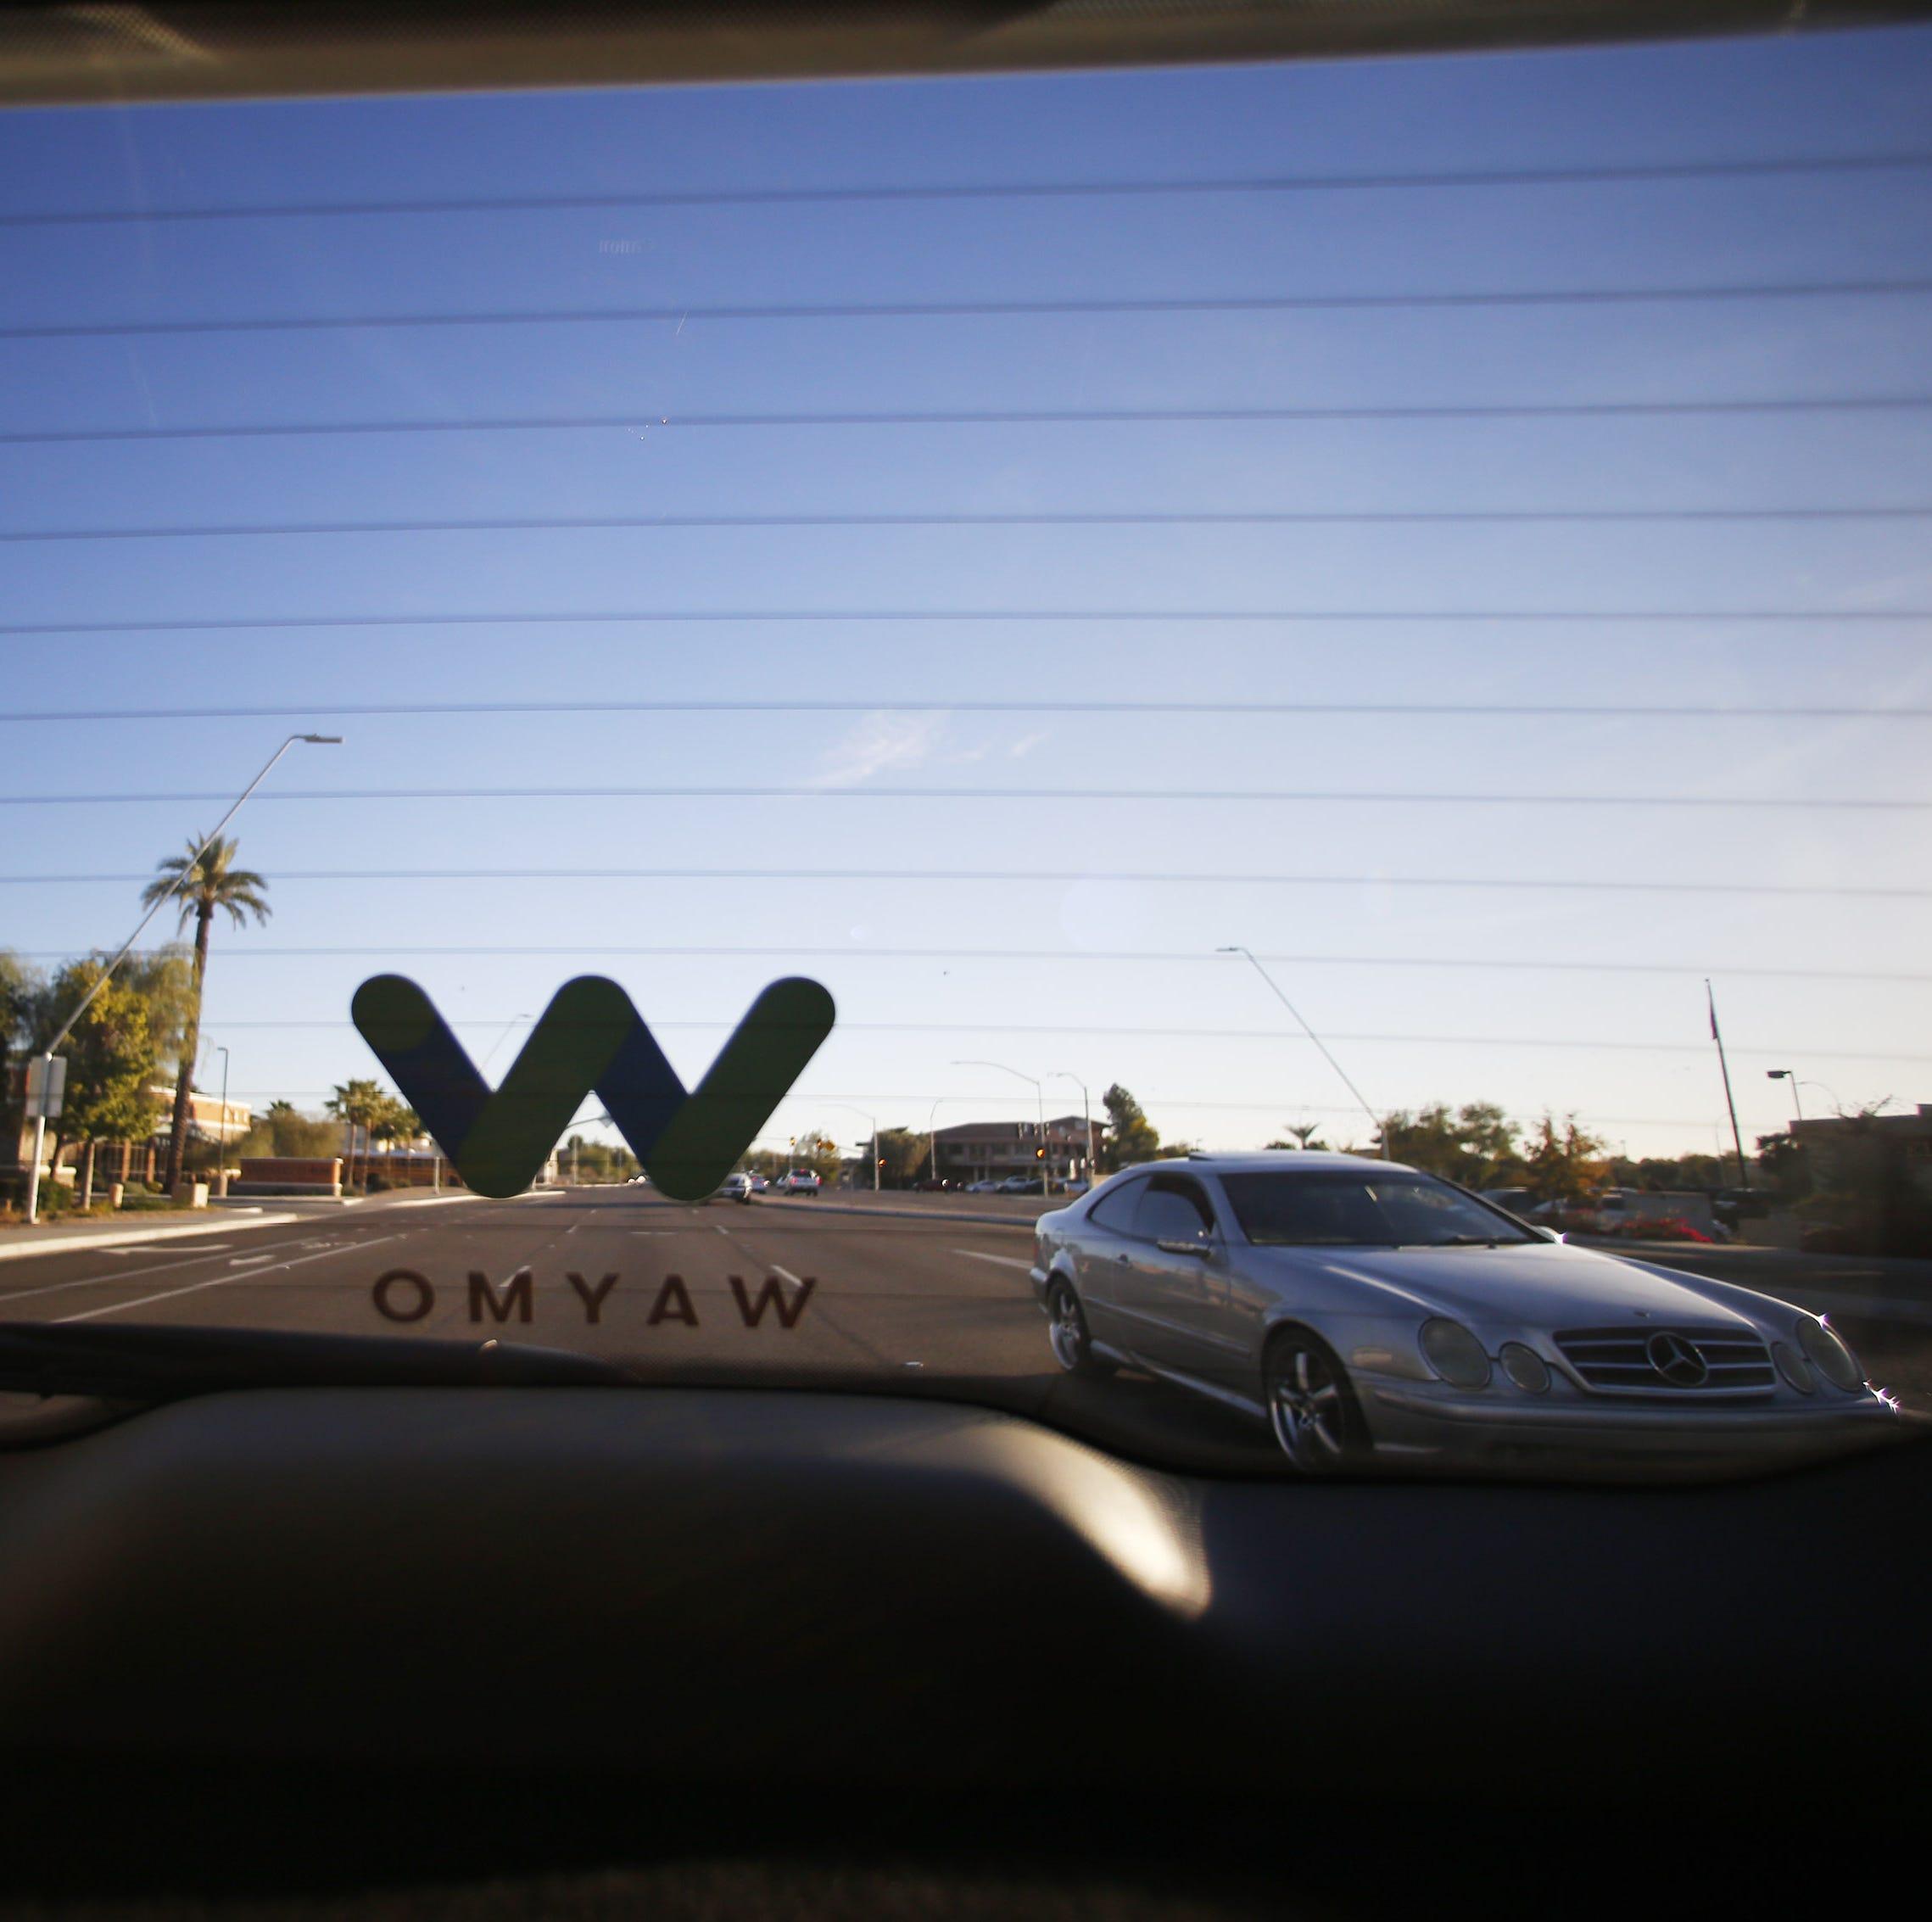 Waymo announces 'Waymo One,' but self-driving ride service isn't public — yet